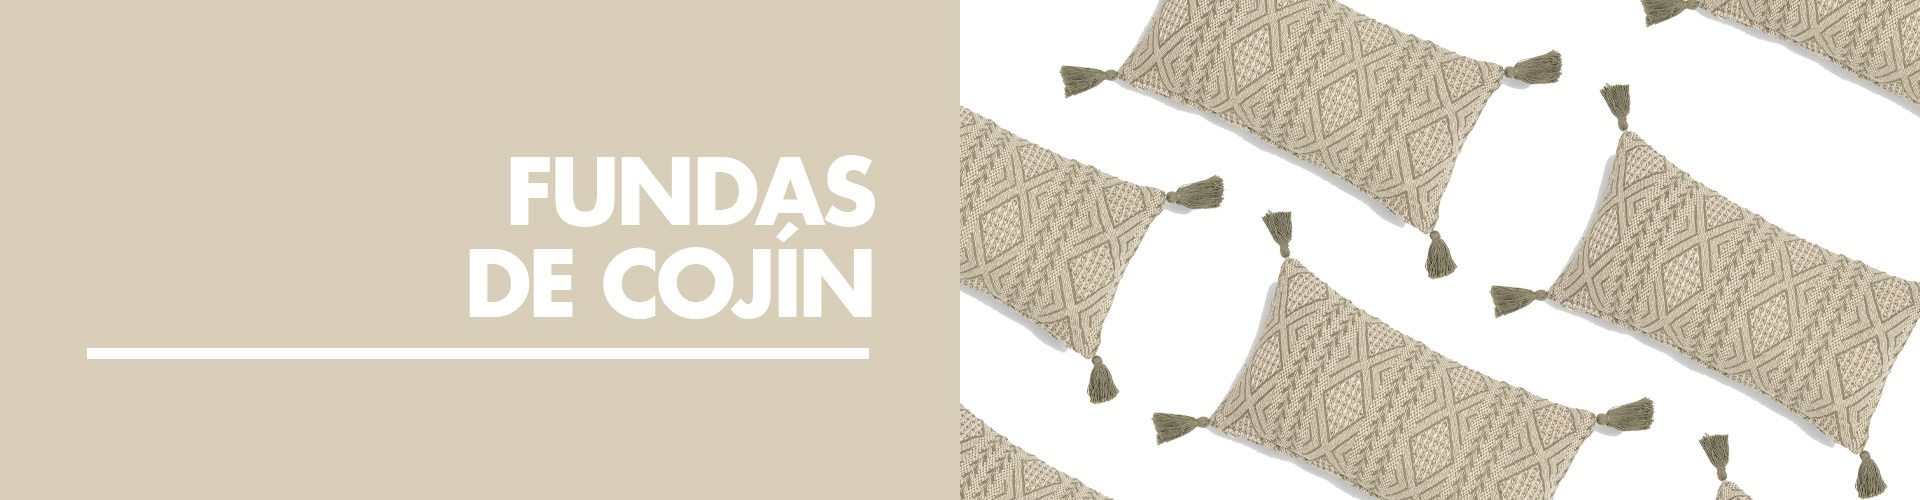 banners_fundas-de-cojín